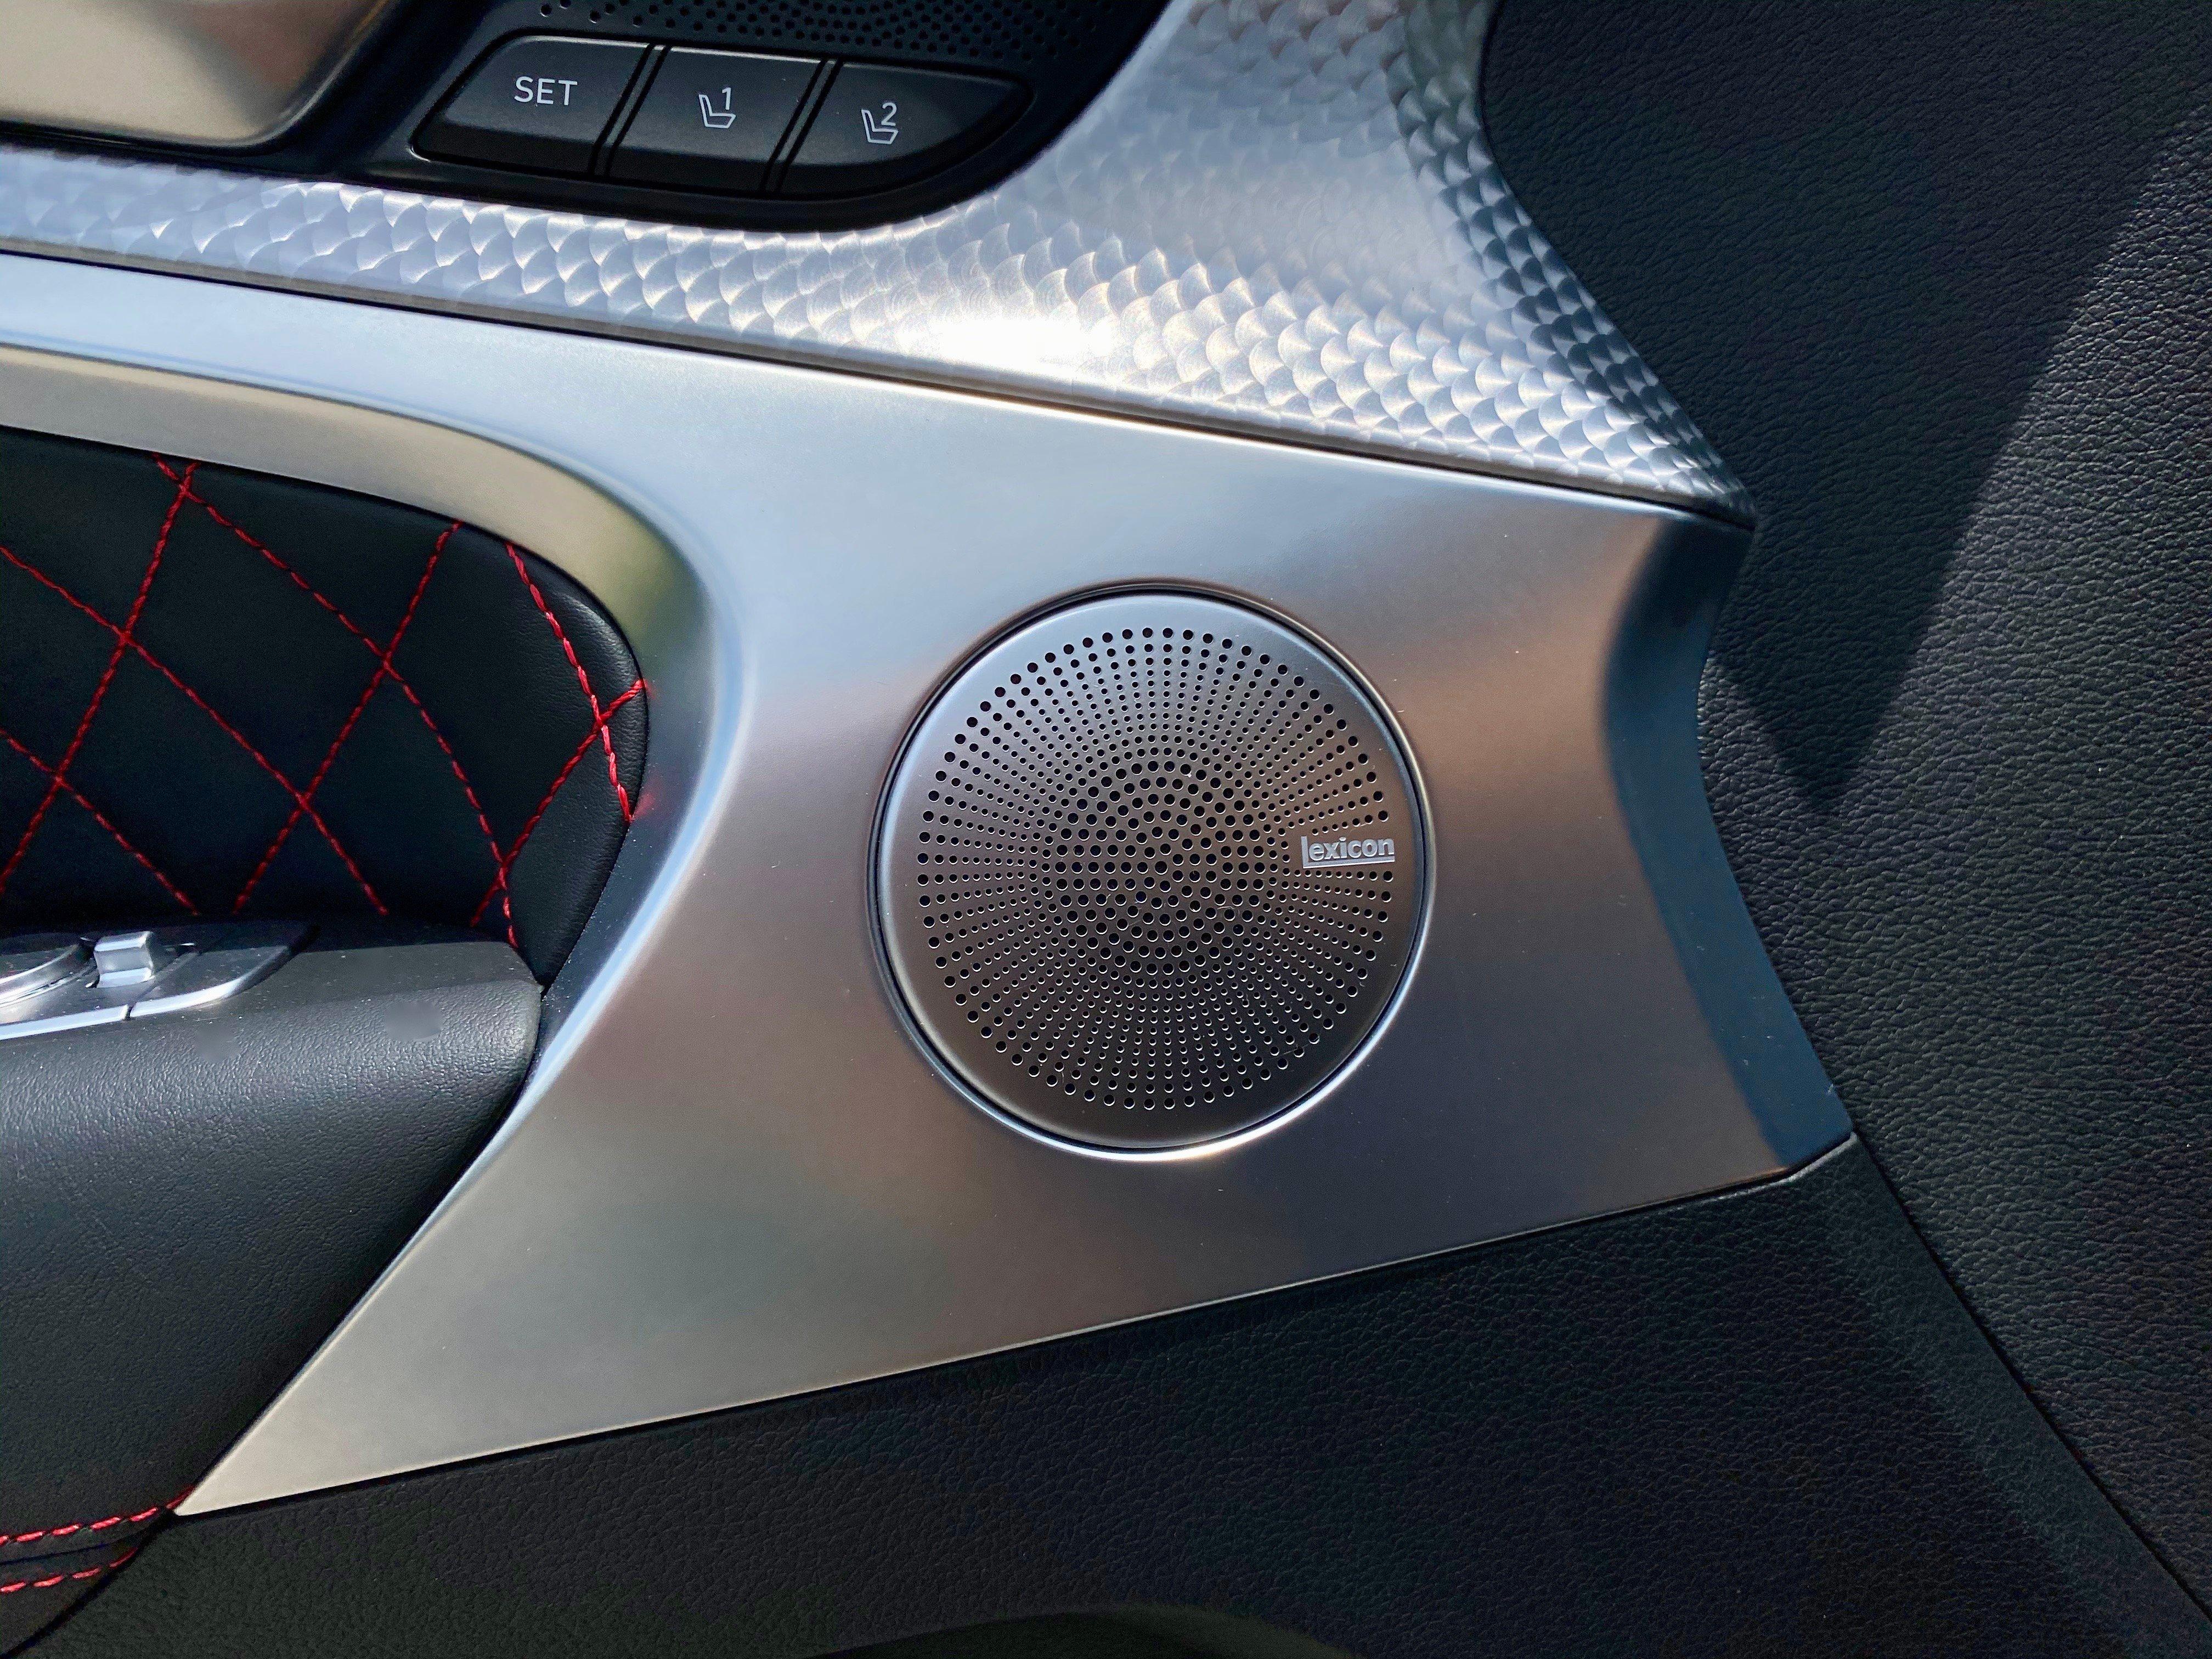 2022-genesis-g70-33t-speaker-carprousa